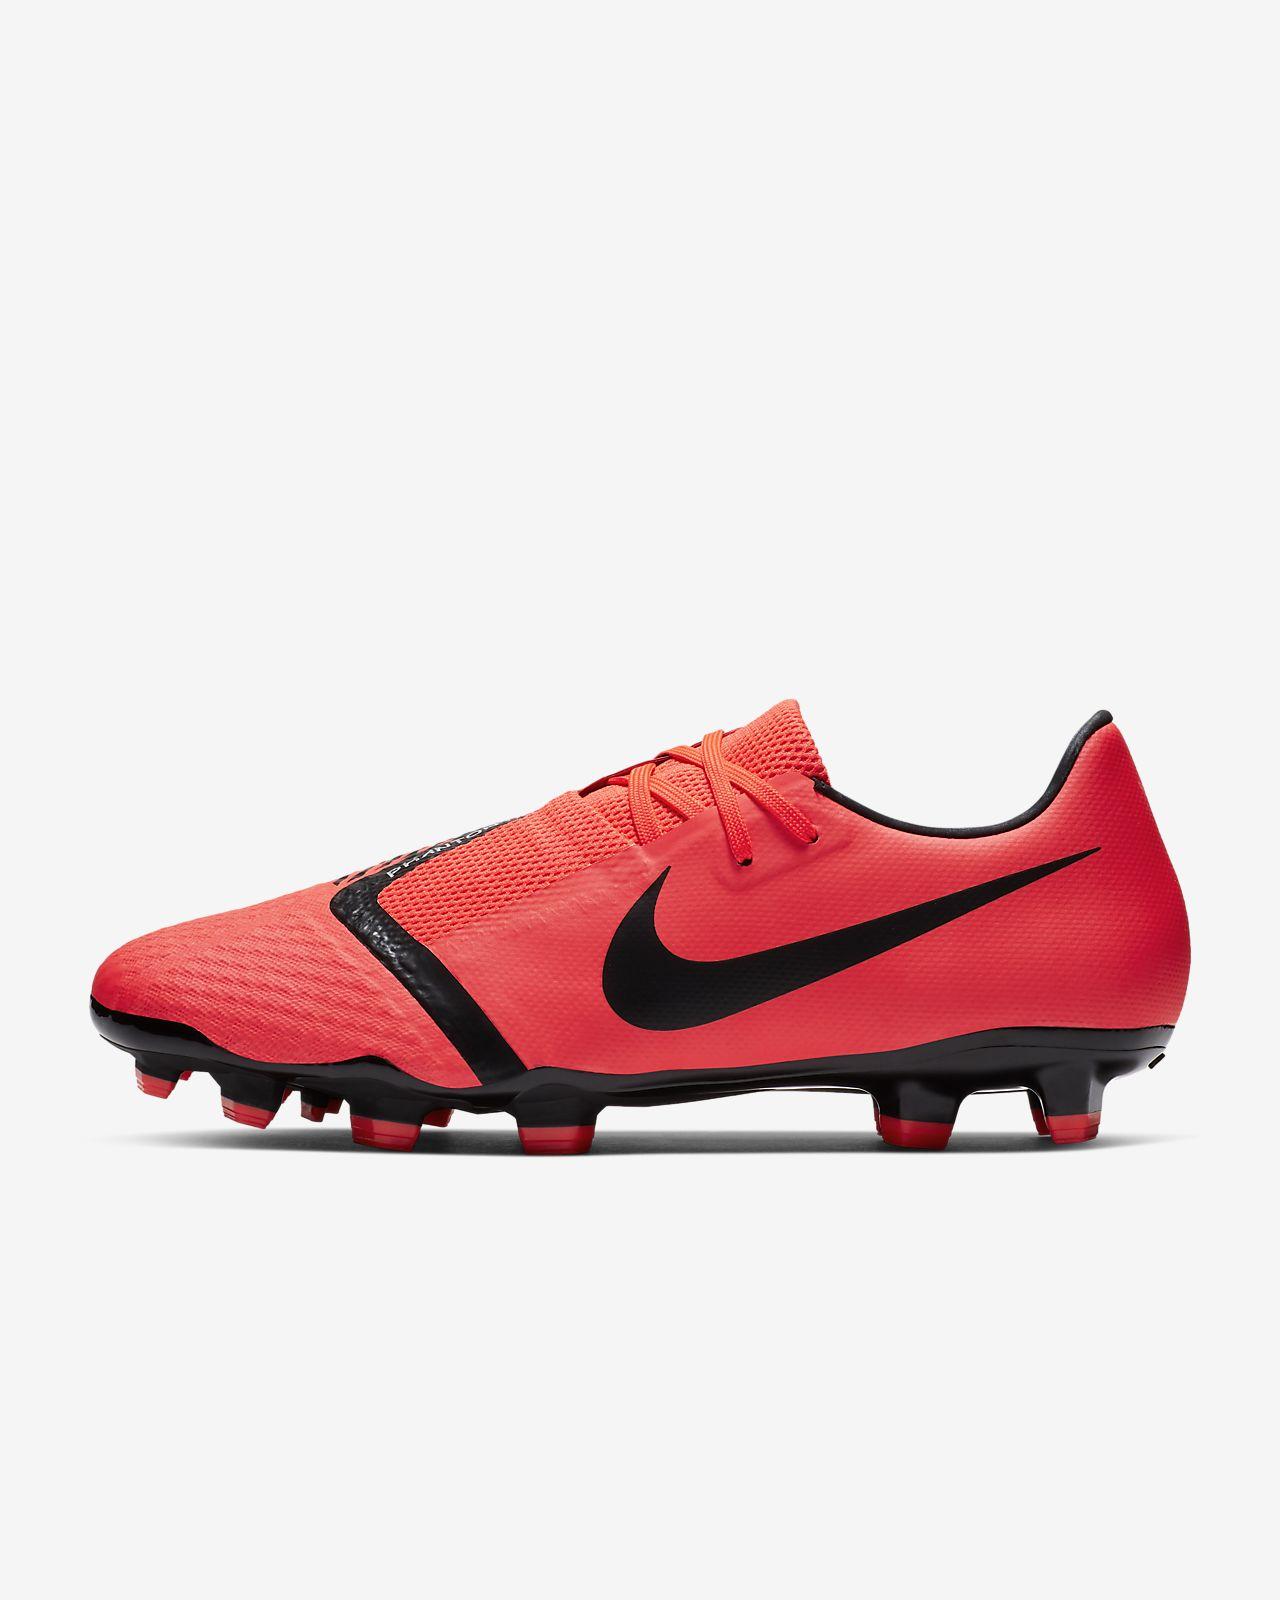 Fotbollssko för gräs Nike PhantomVNM Academy FG Game Over